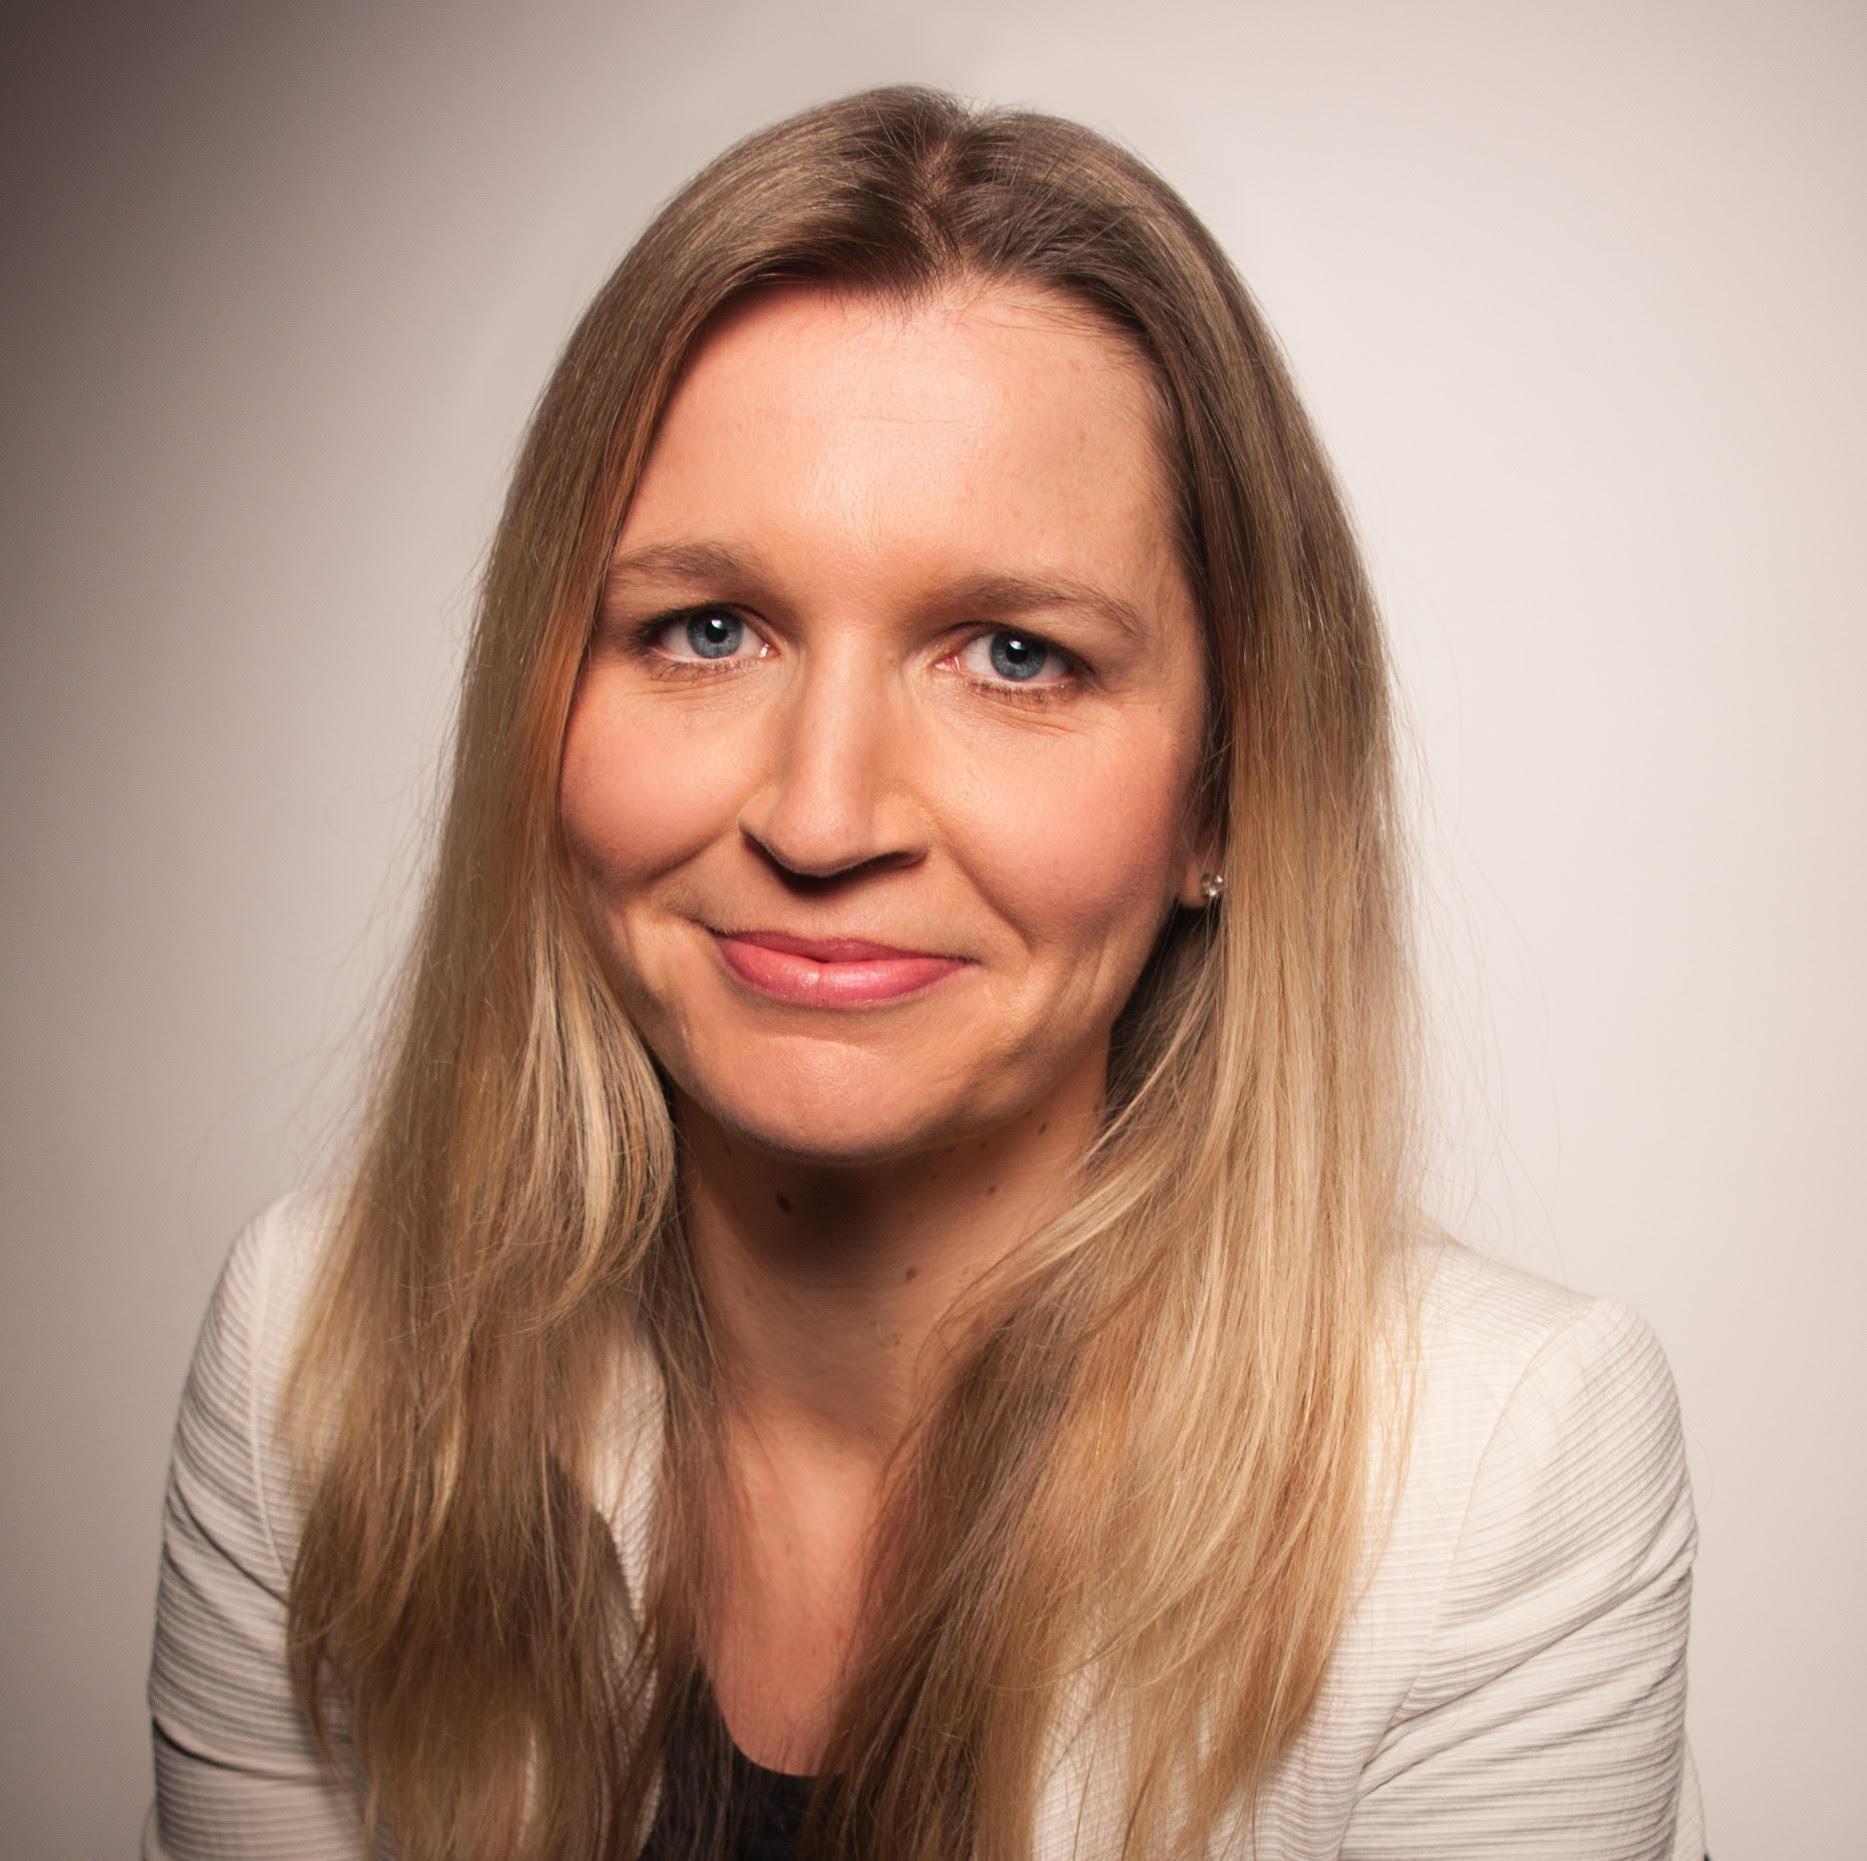 Economist and author Angela Jackson